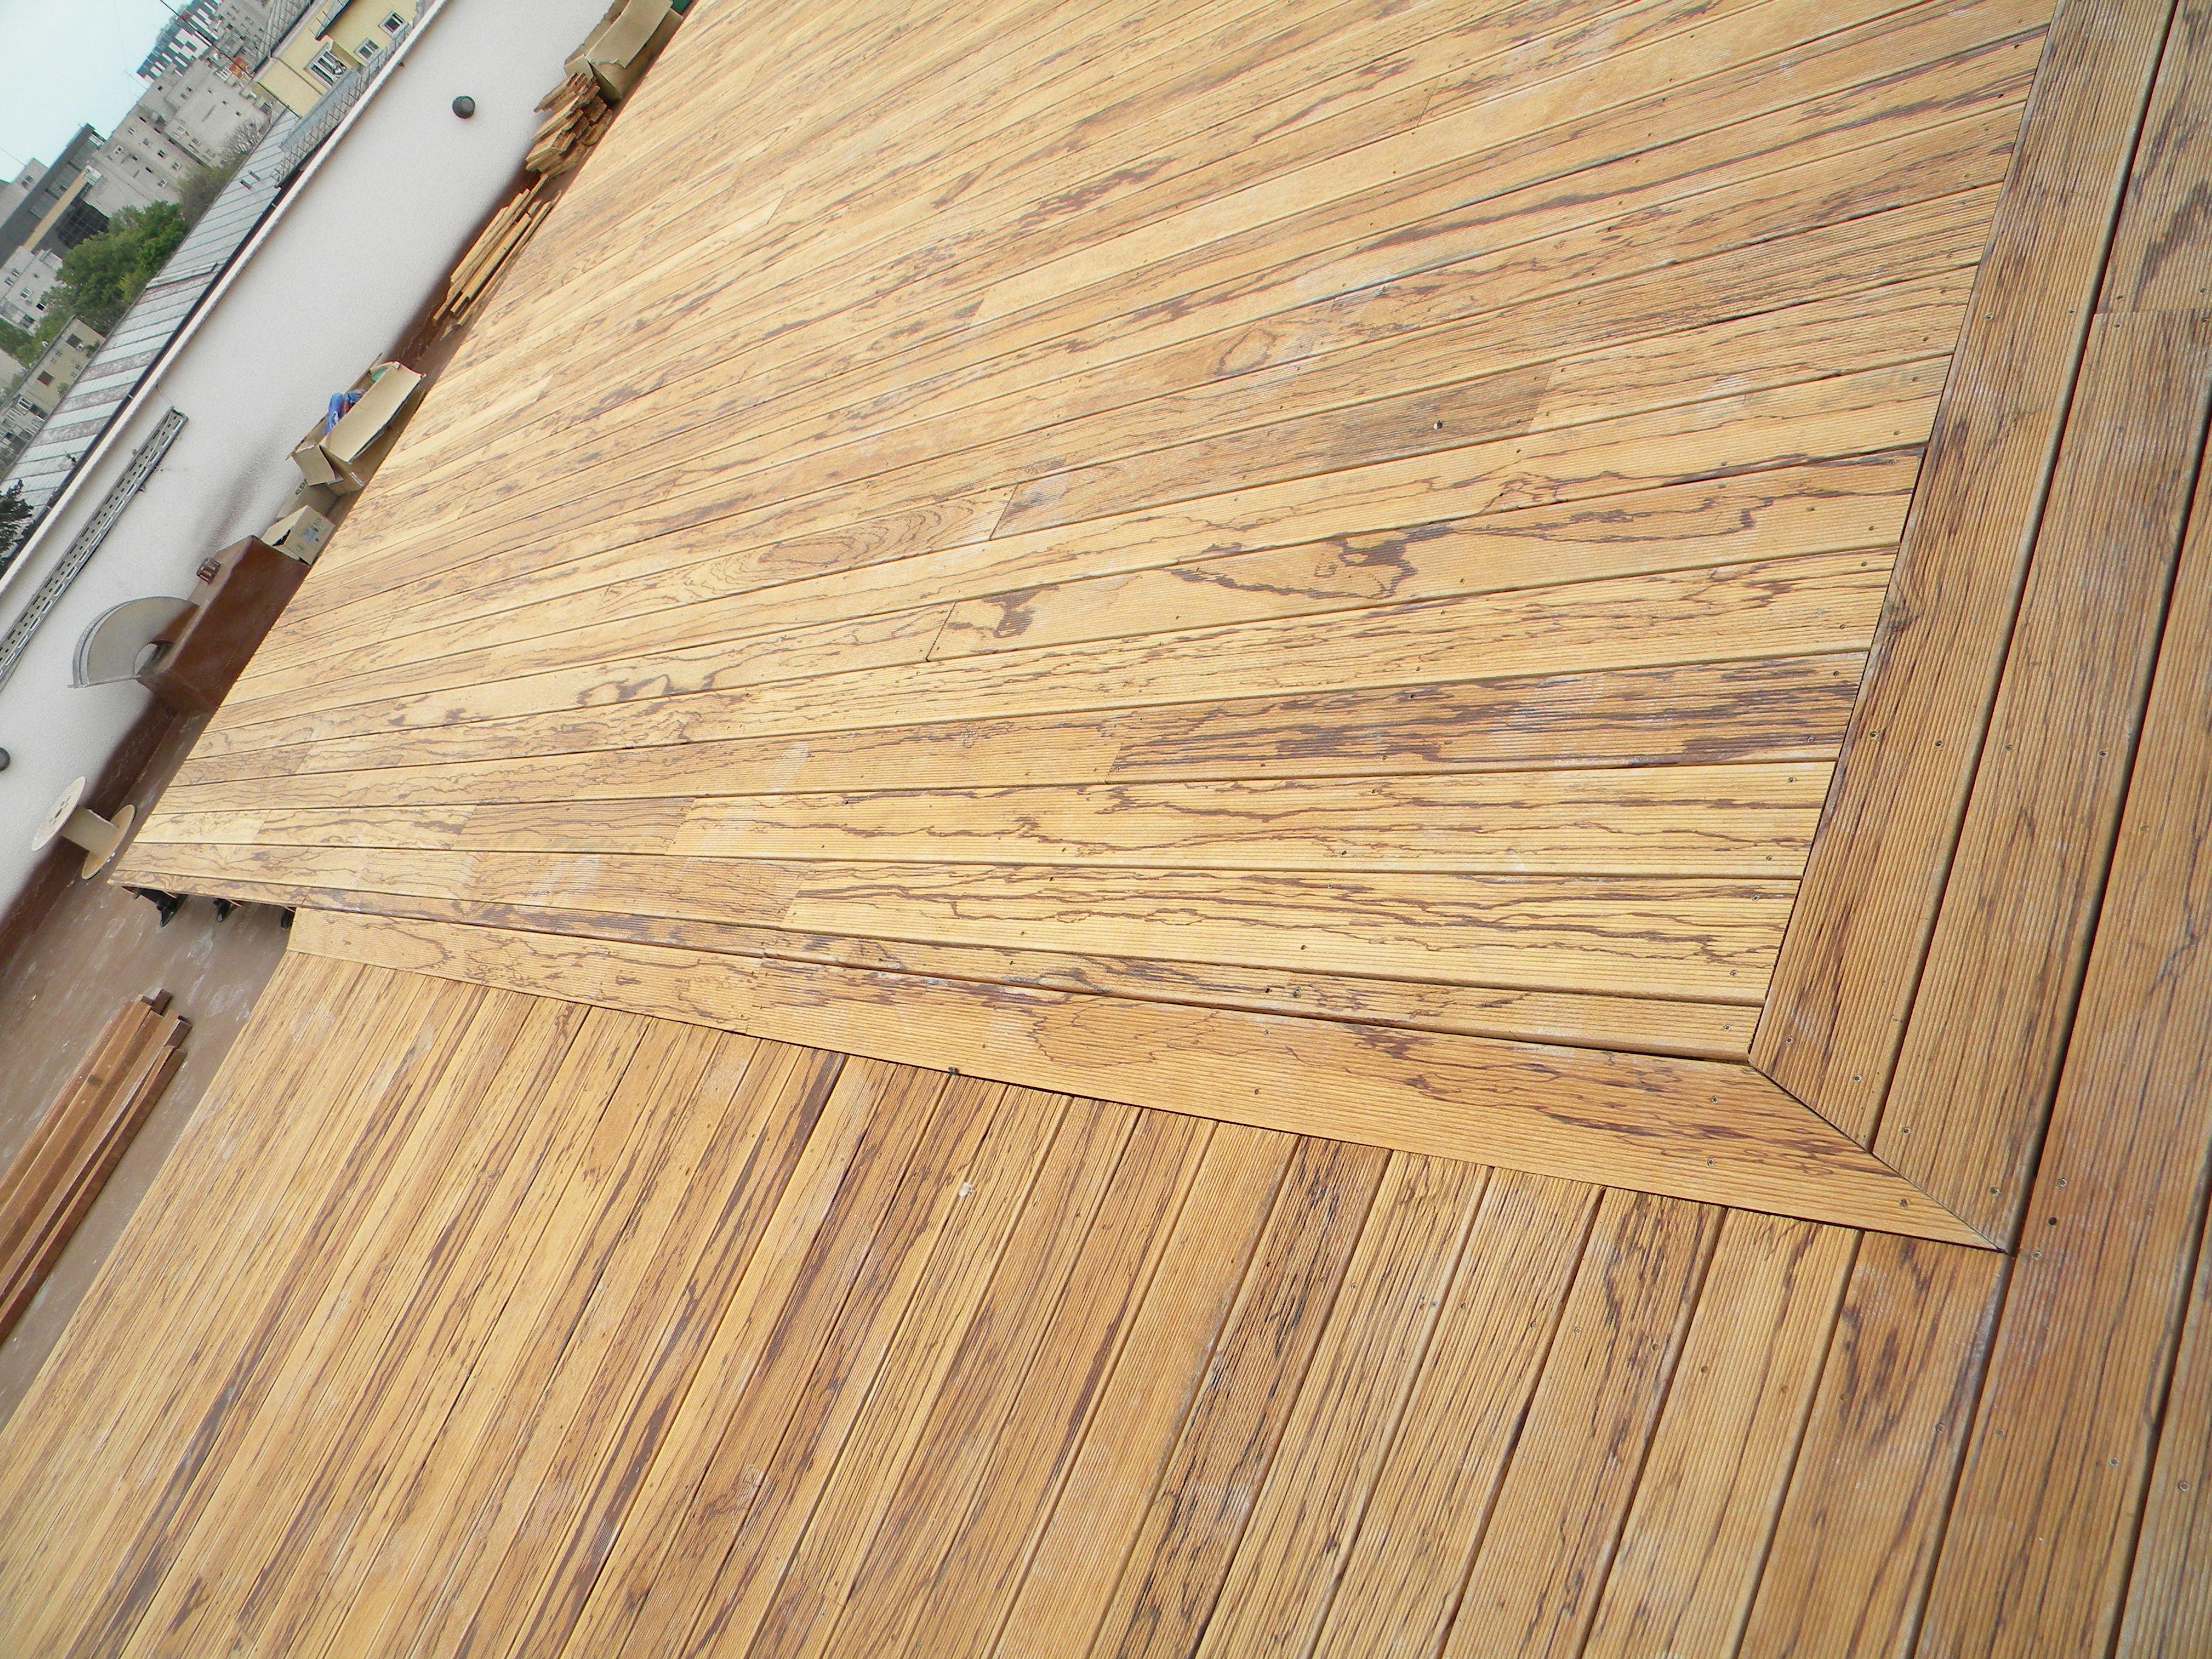 Deck-uri lemn - Angelim Rajado SELVA FLOORS - Poza 9